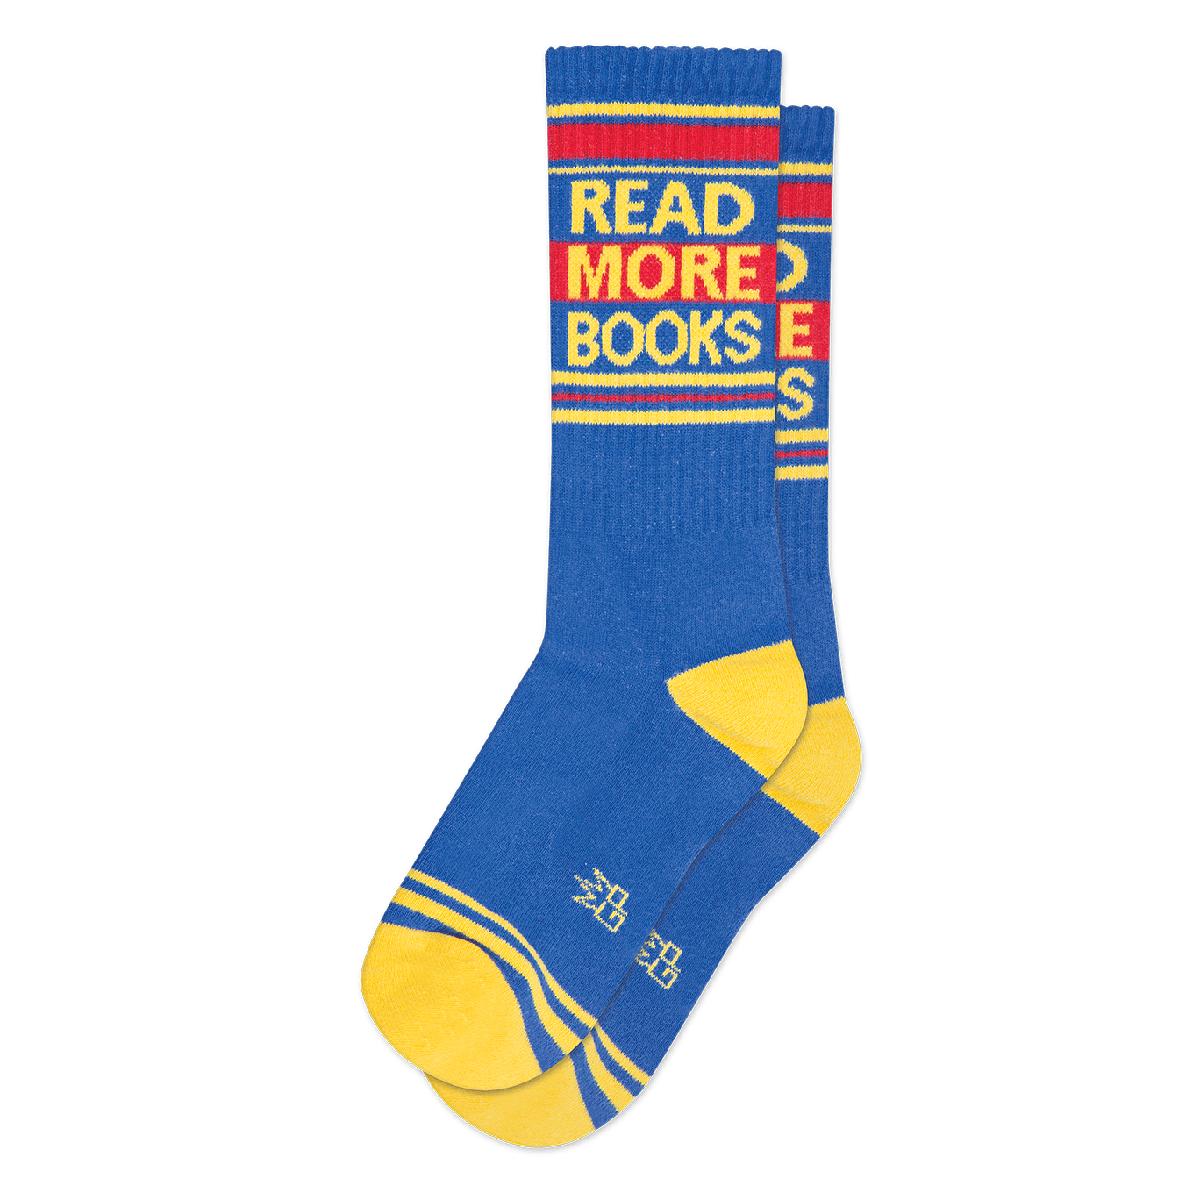 Read More Books Socks